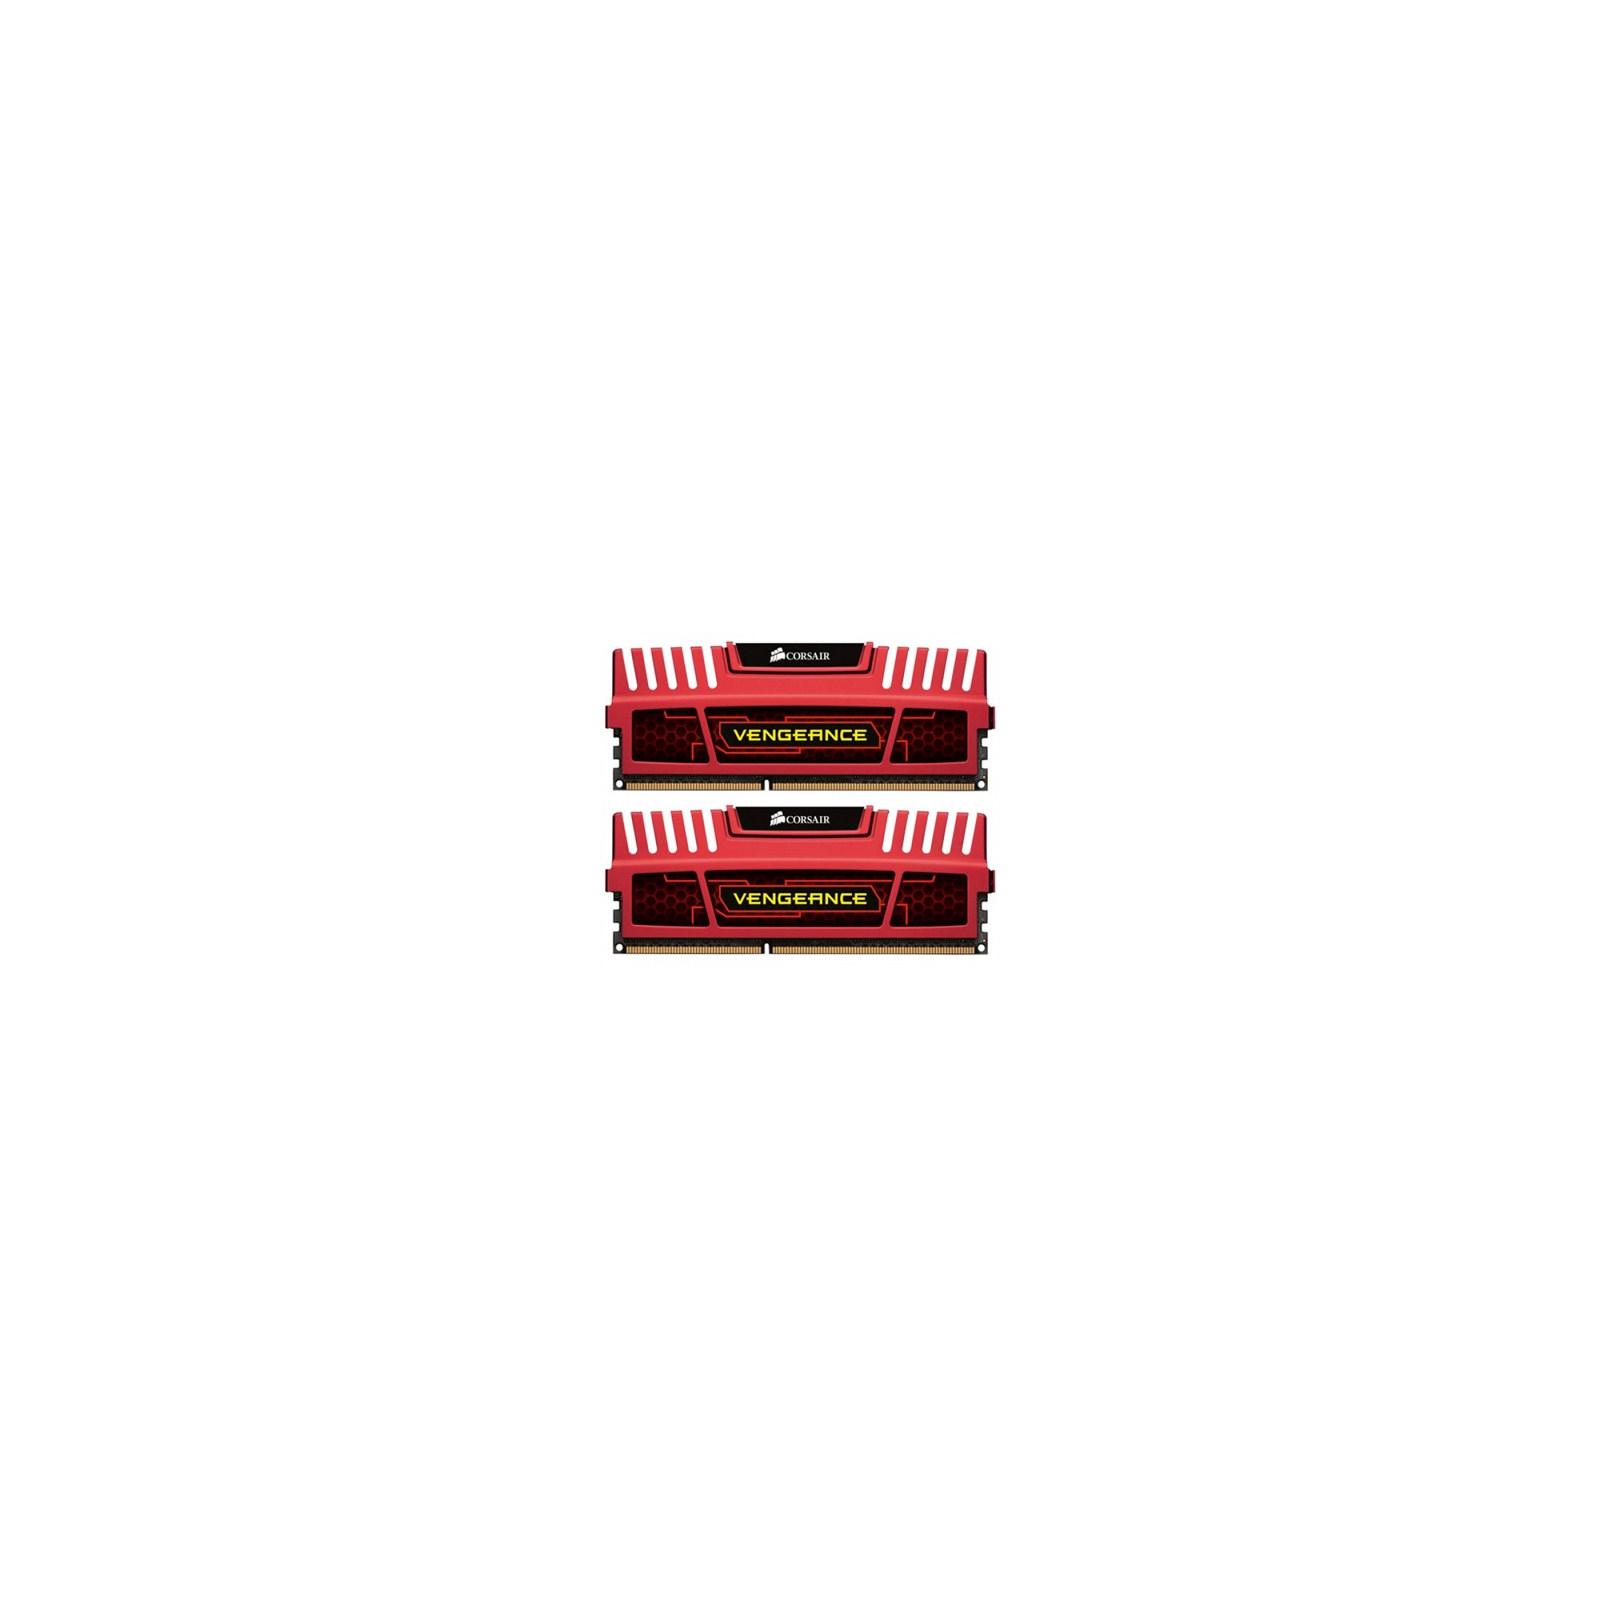 Модуль памяти для компьютера DDR3 8GB (2x4GB) 1600 MHz CORSAIR (CMZ8GX3M2A1600C9R)